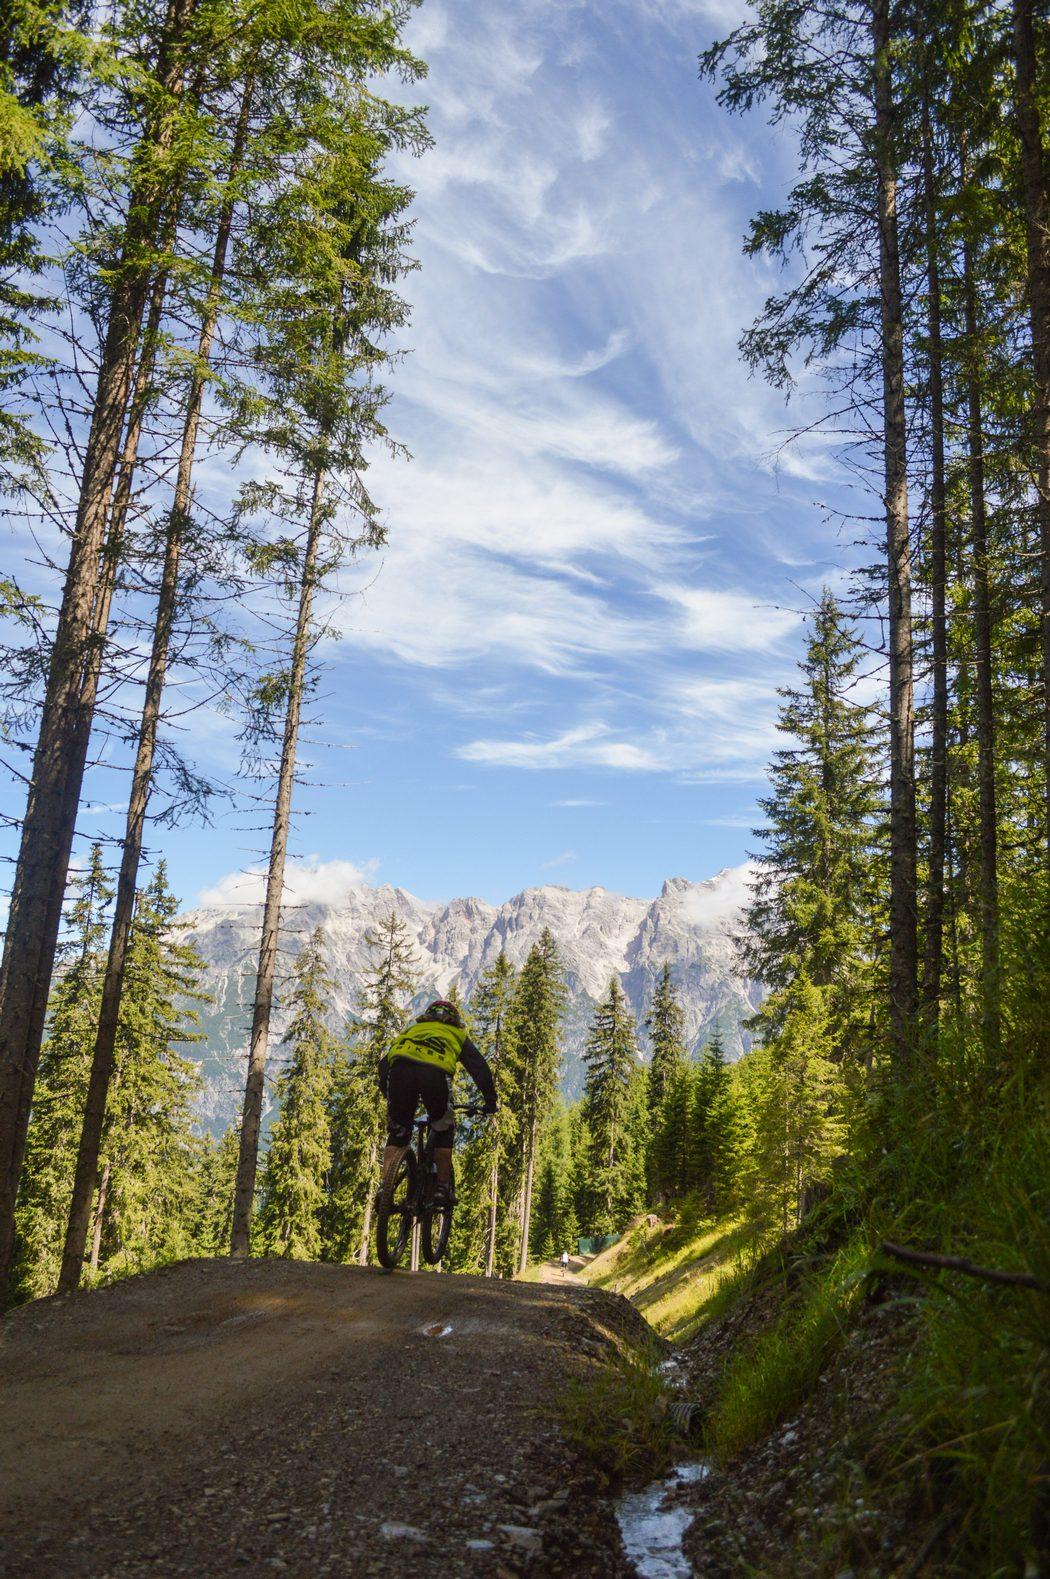 Odkrywamy region Saalfelden Leogang - część 1: Bike Park Leogang